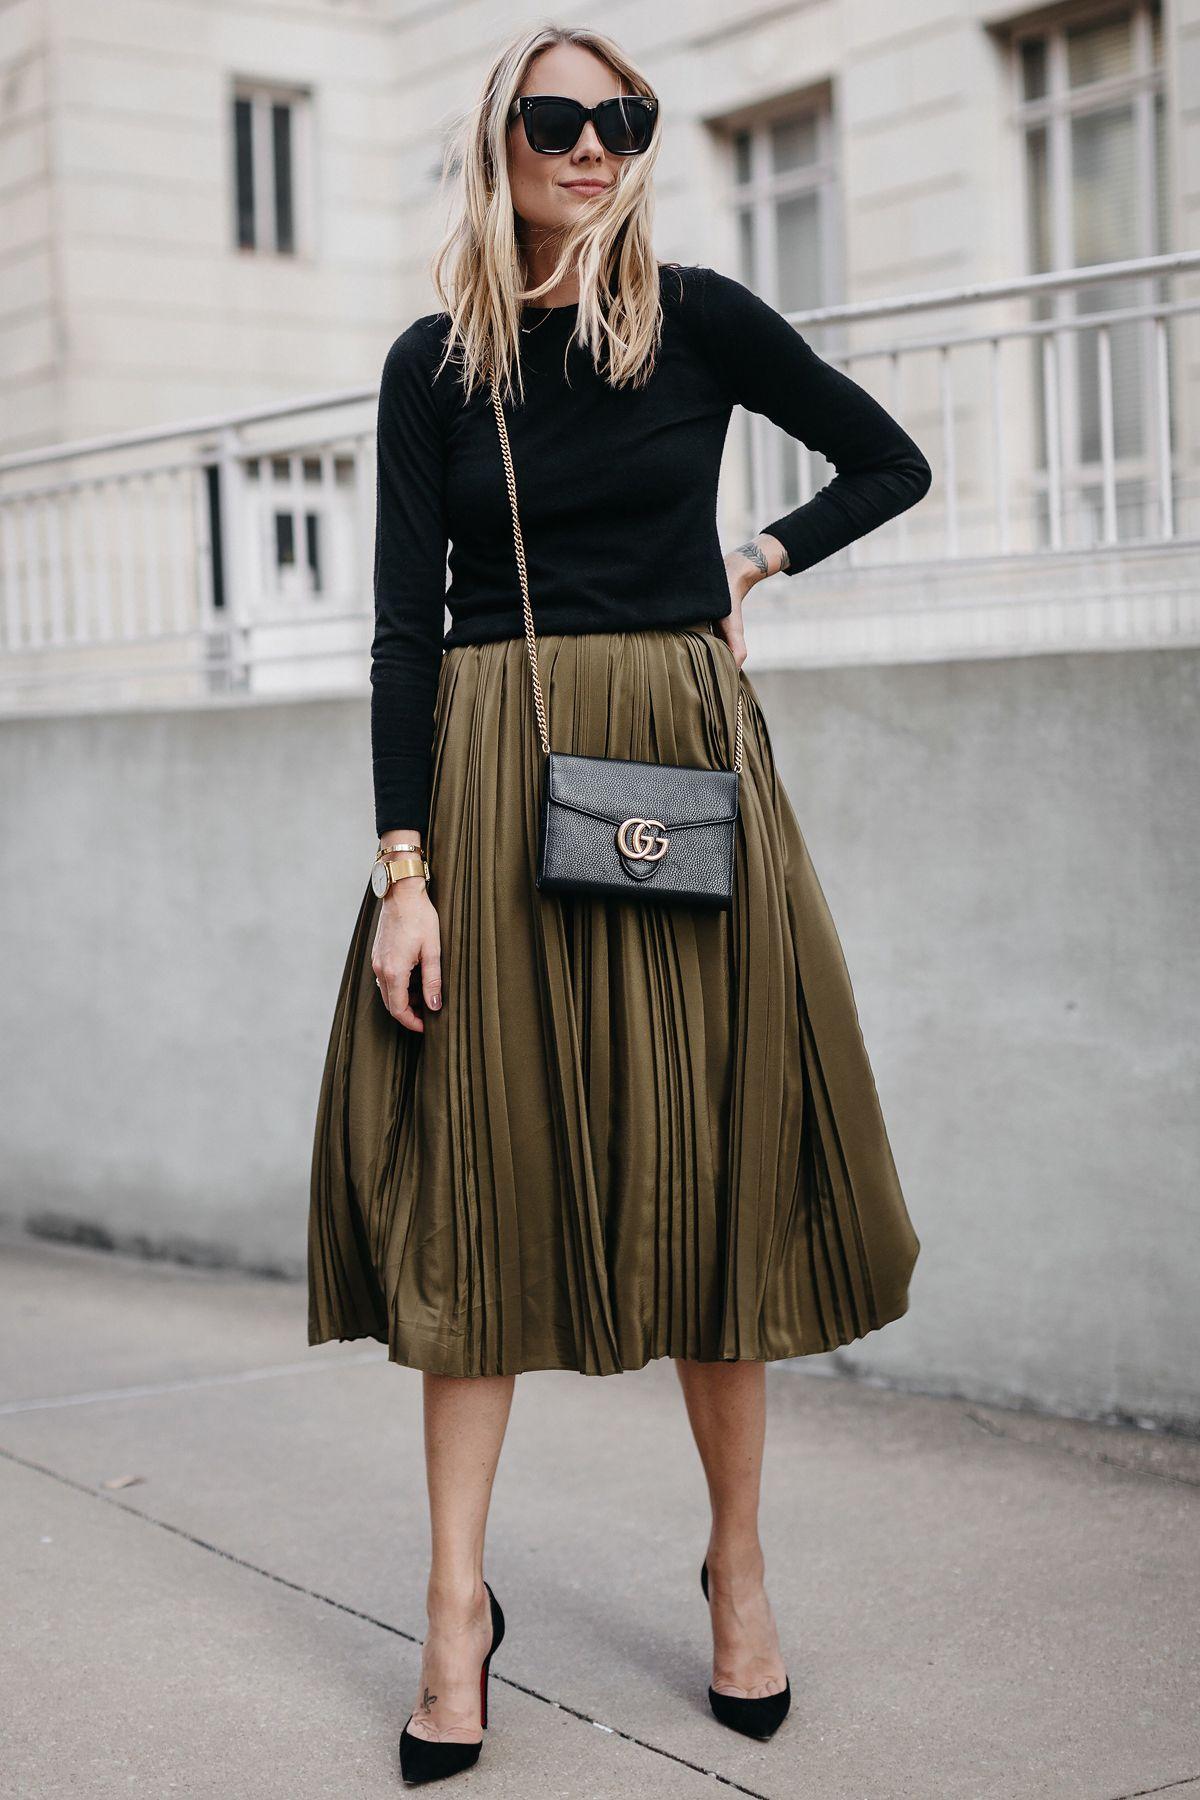 Black Sweater Robert Rodriguez Green Pleated Midi Skirt Gucci Marmont  Handbag Christian Louboutin Black Pumps Fashion Jackson